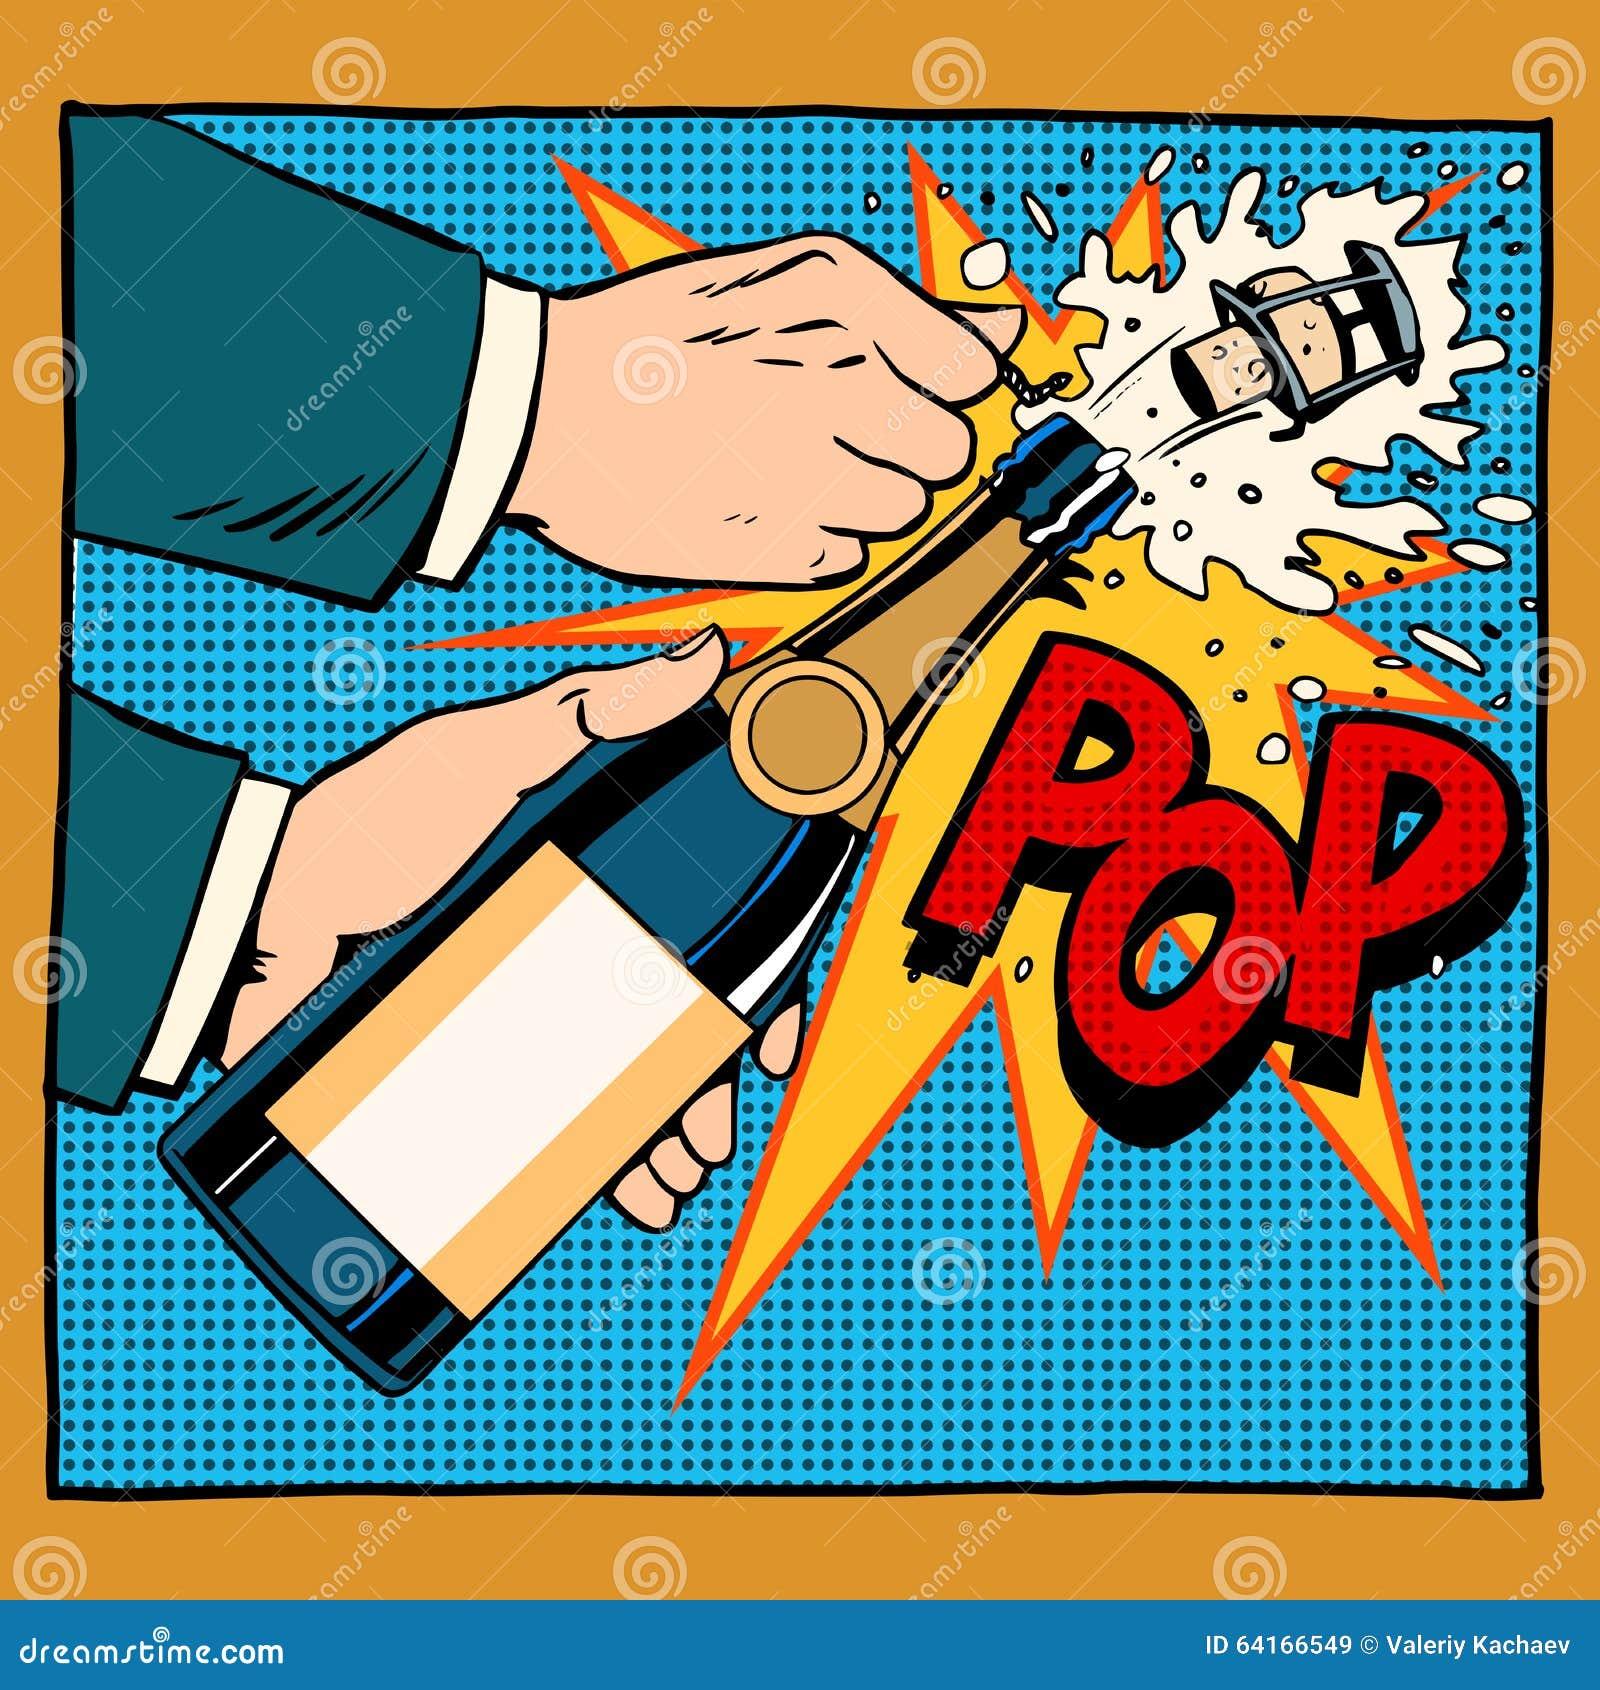 Estilo retro del arte pop de la botella del champán de la abertura